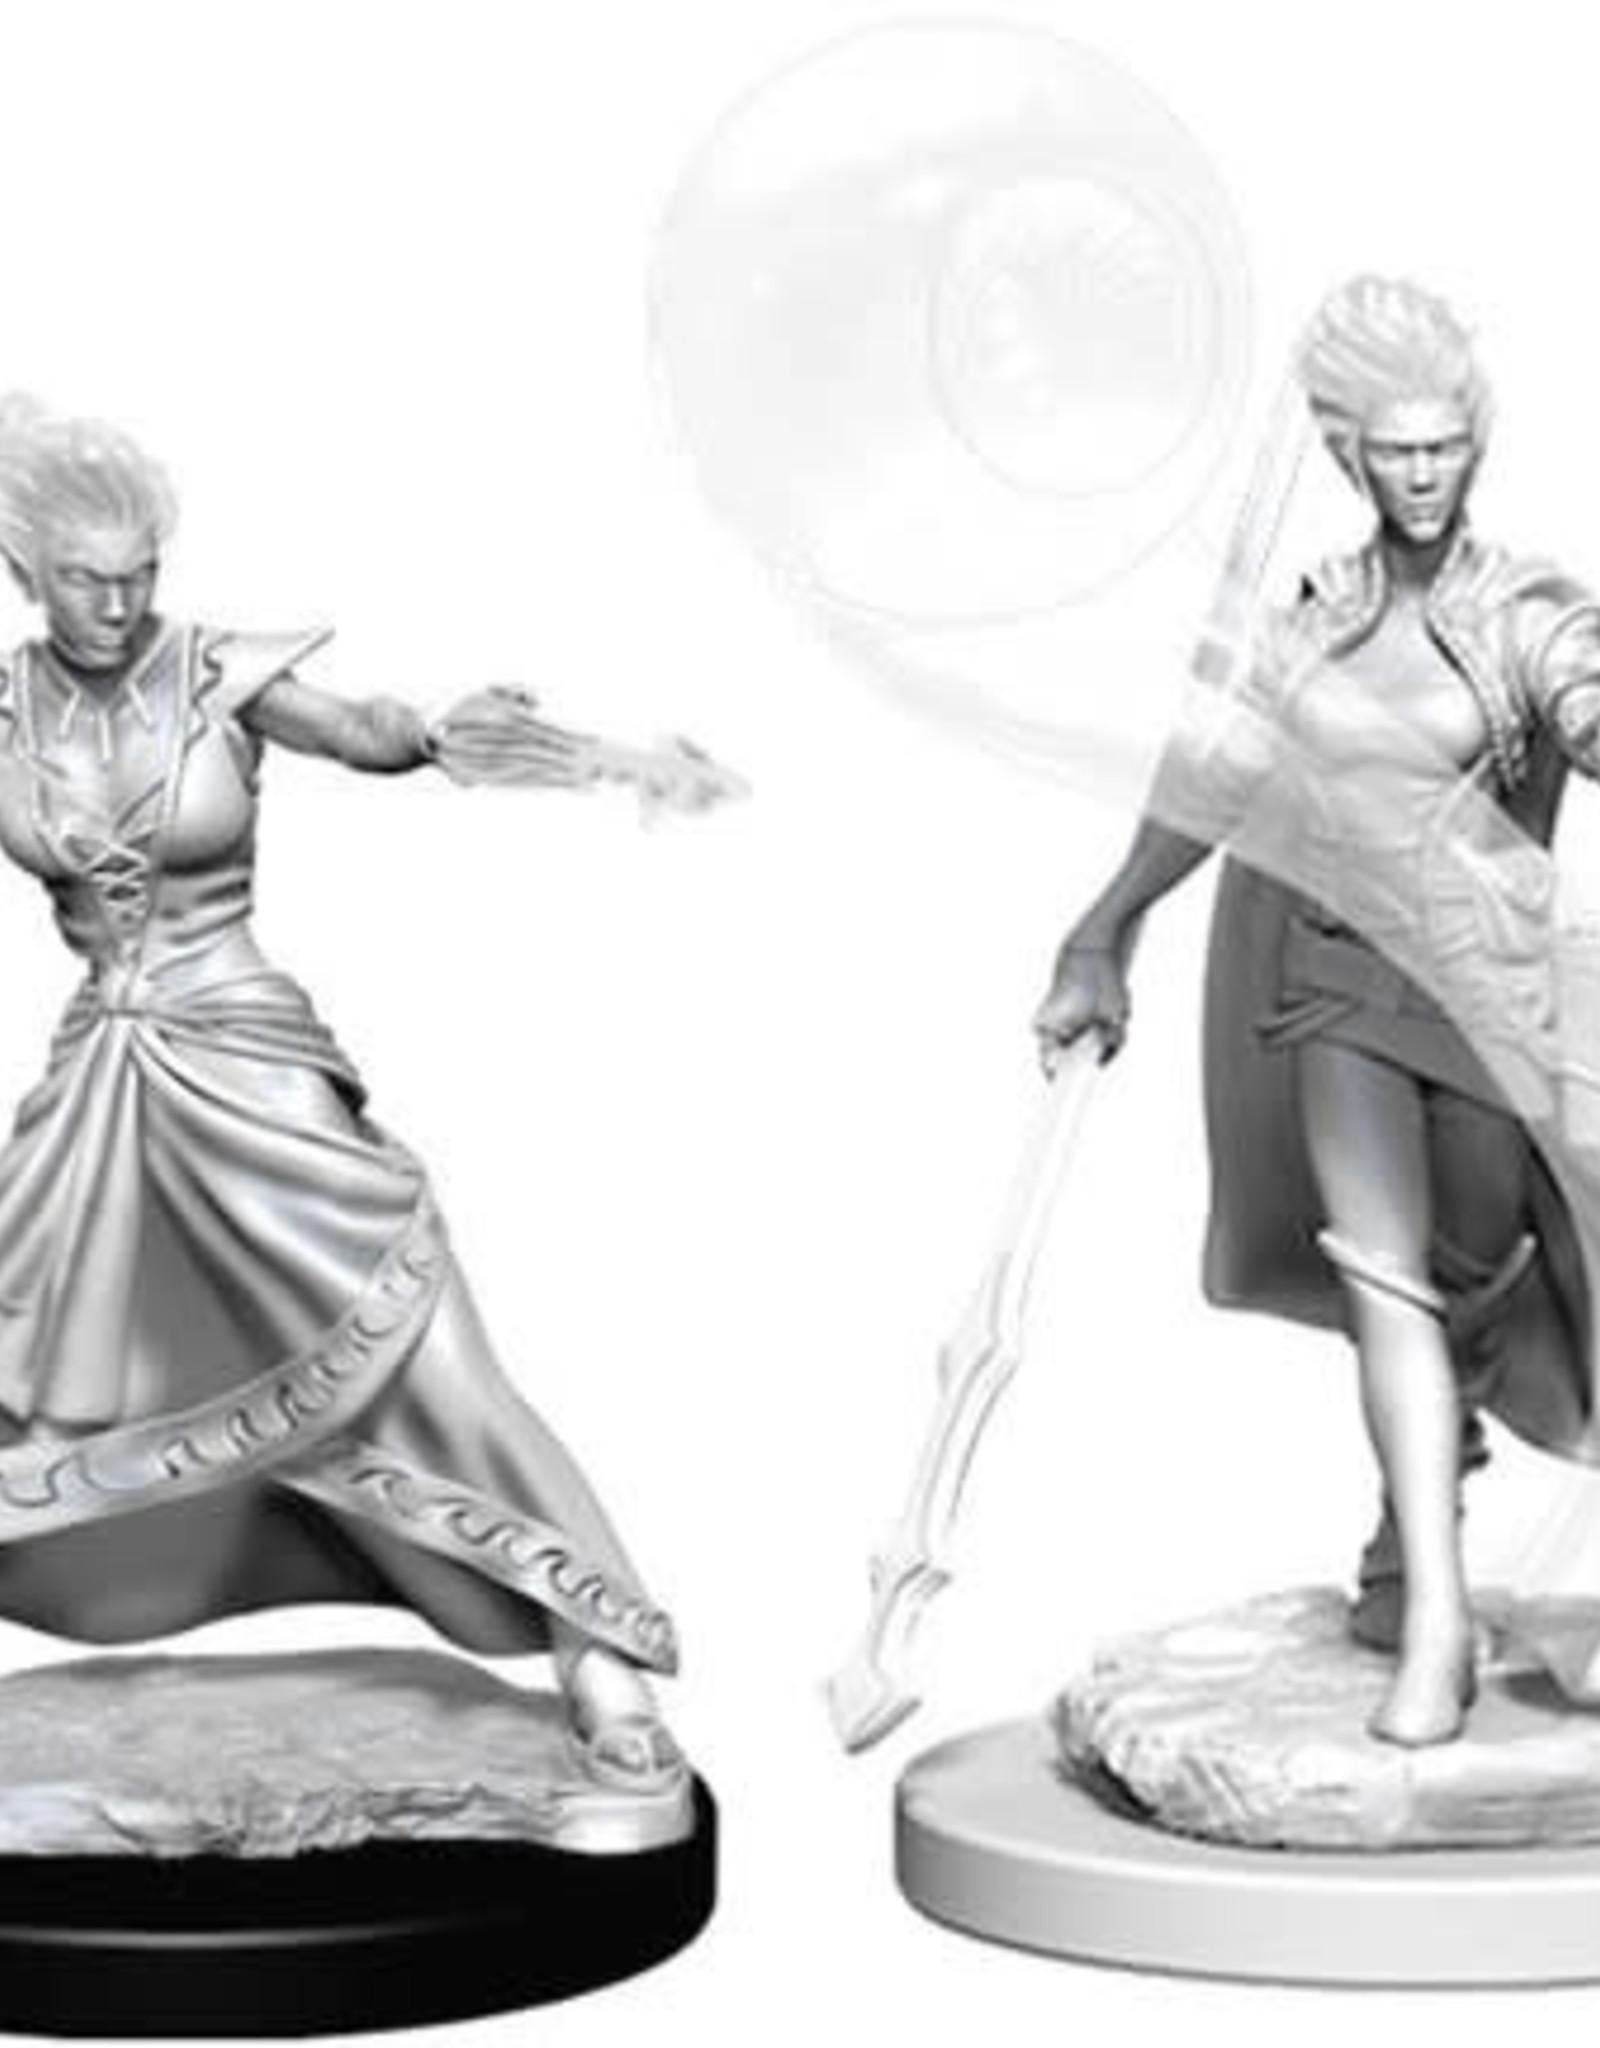 WizKids D&D Nolzur Fire Genasi Wizard (She/Her/They/Them)